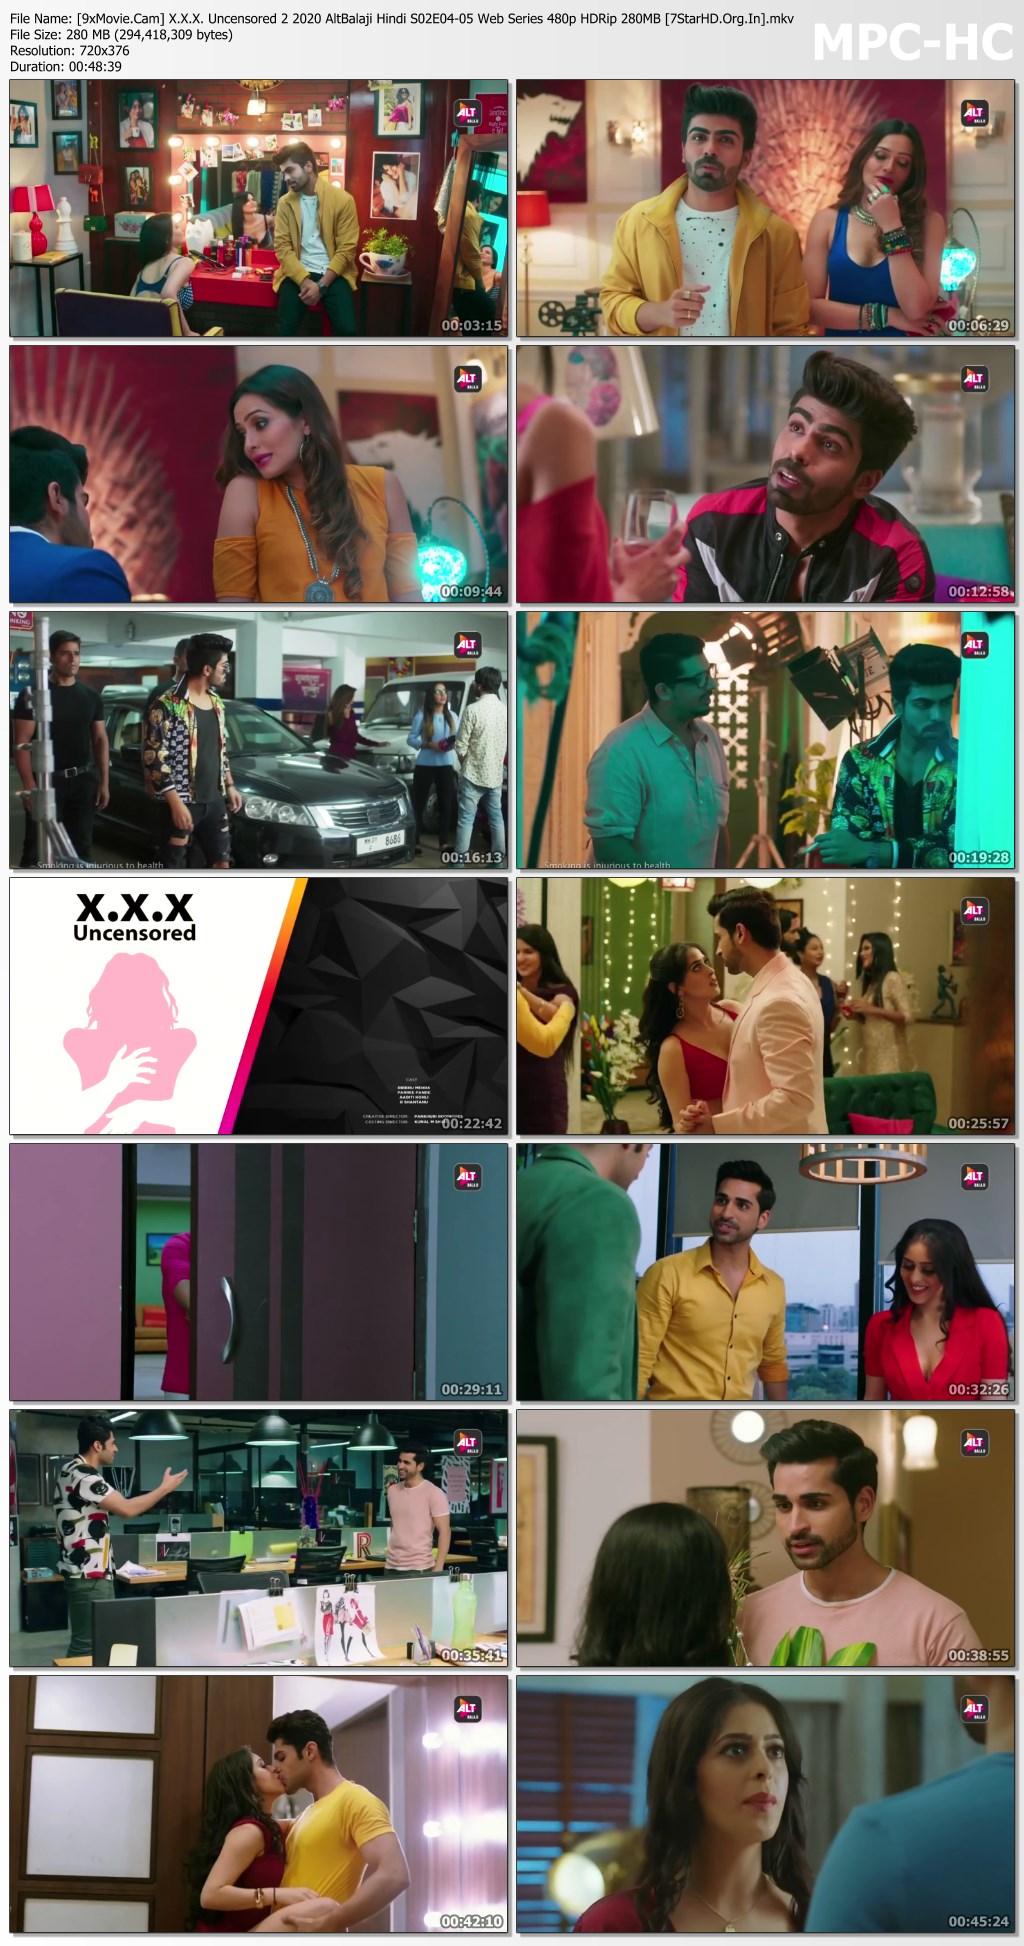 X.X.X. Uncensored 2 2020 AltBalaji Hindi S02E04-05 Web Series 480p HDRip x264 280MB